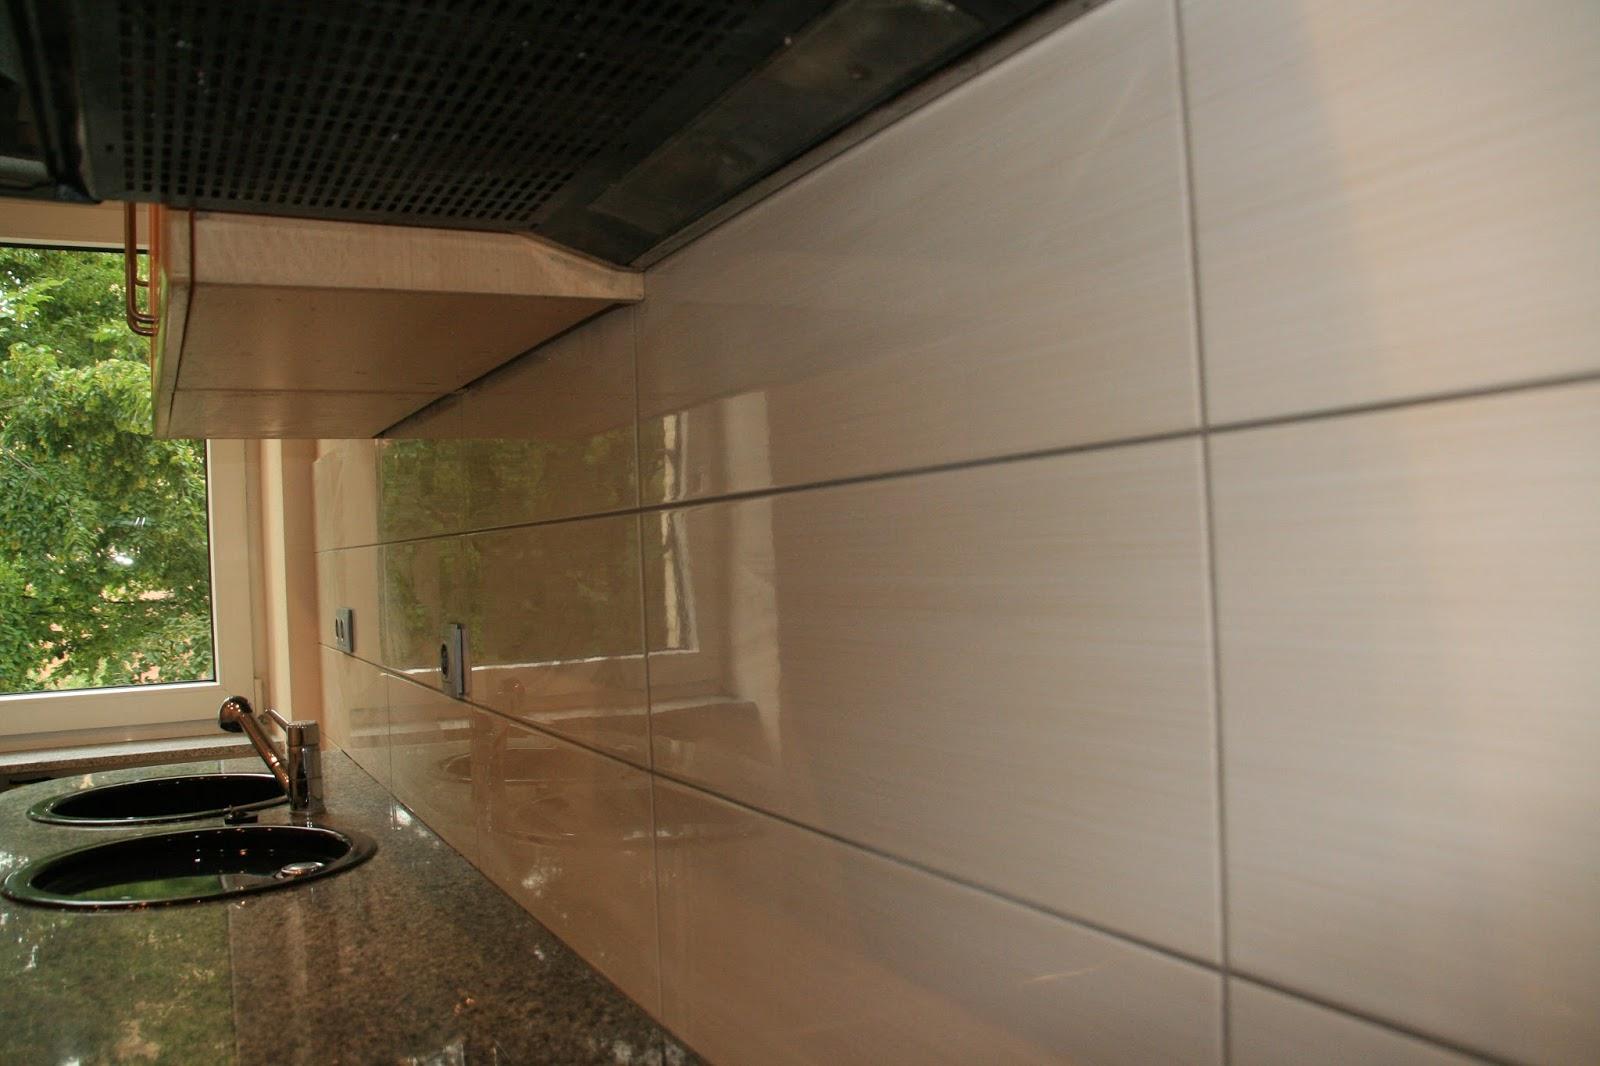 B der renovierungen fliesenleger mannheim - Waschmaschinenanschluss wand ...